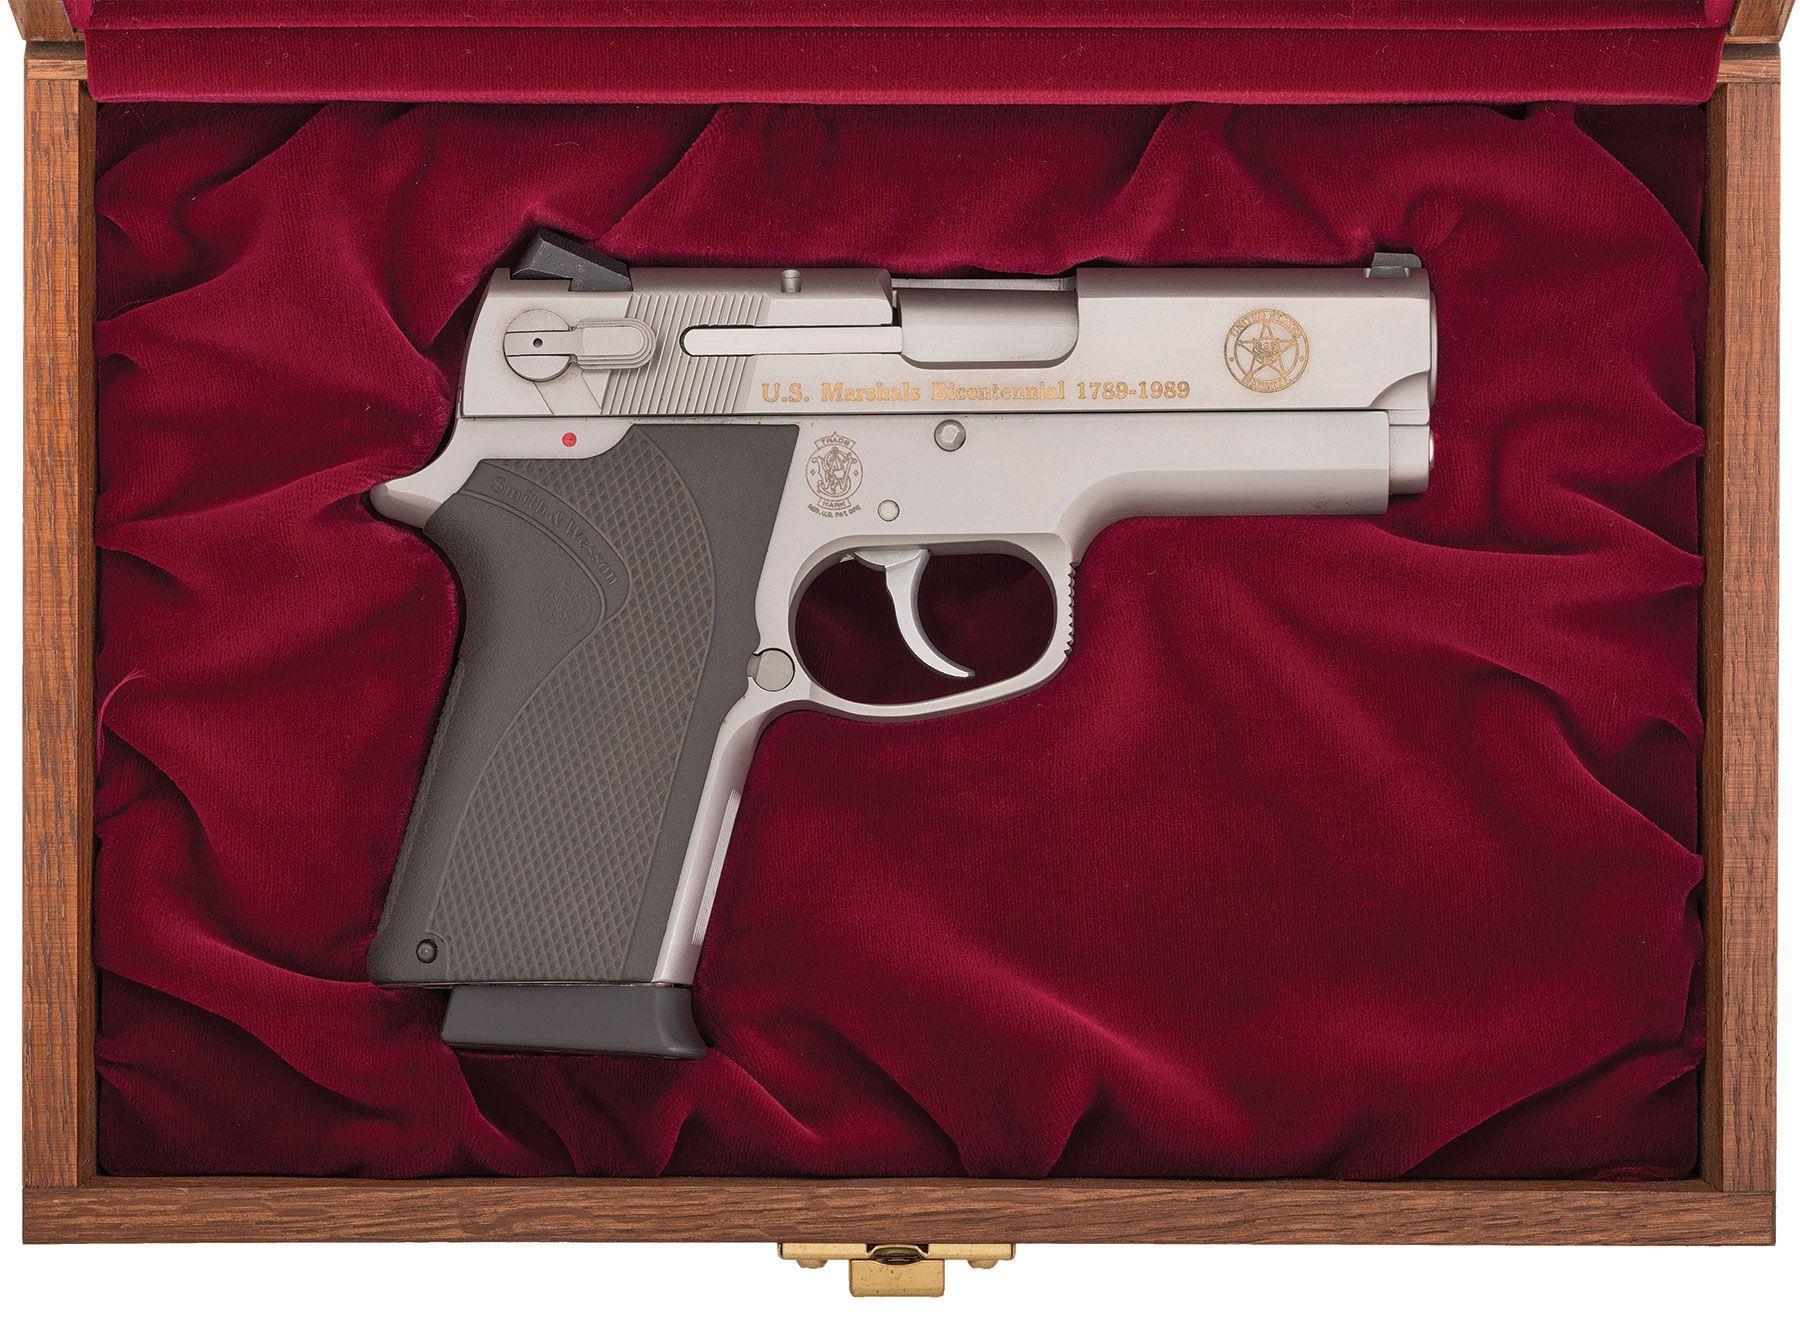 Us Marshal Auction >> S&W Model 4516-1 U.S. Marshal Bicentennial Prototype Pistol